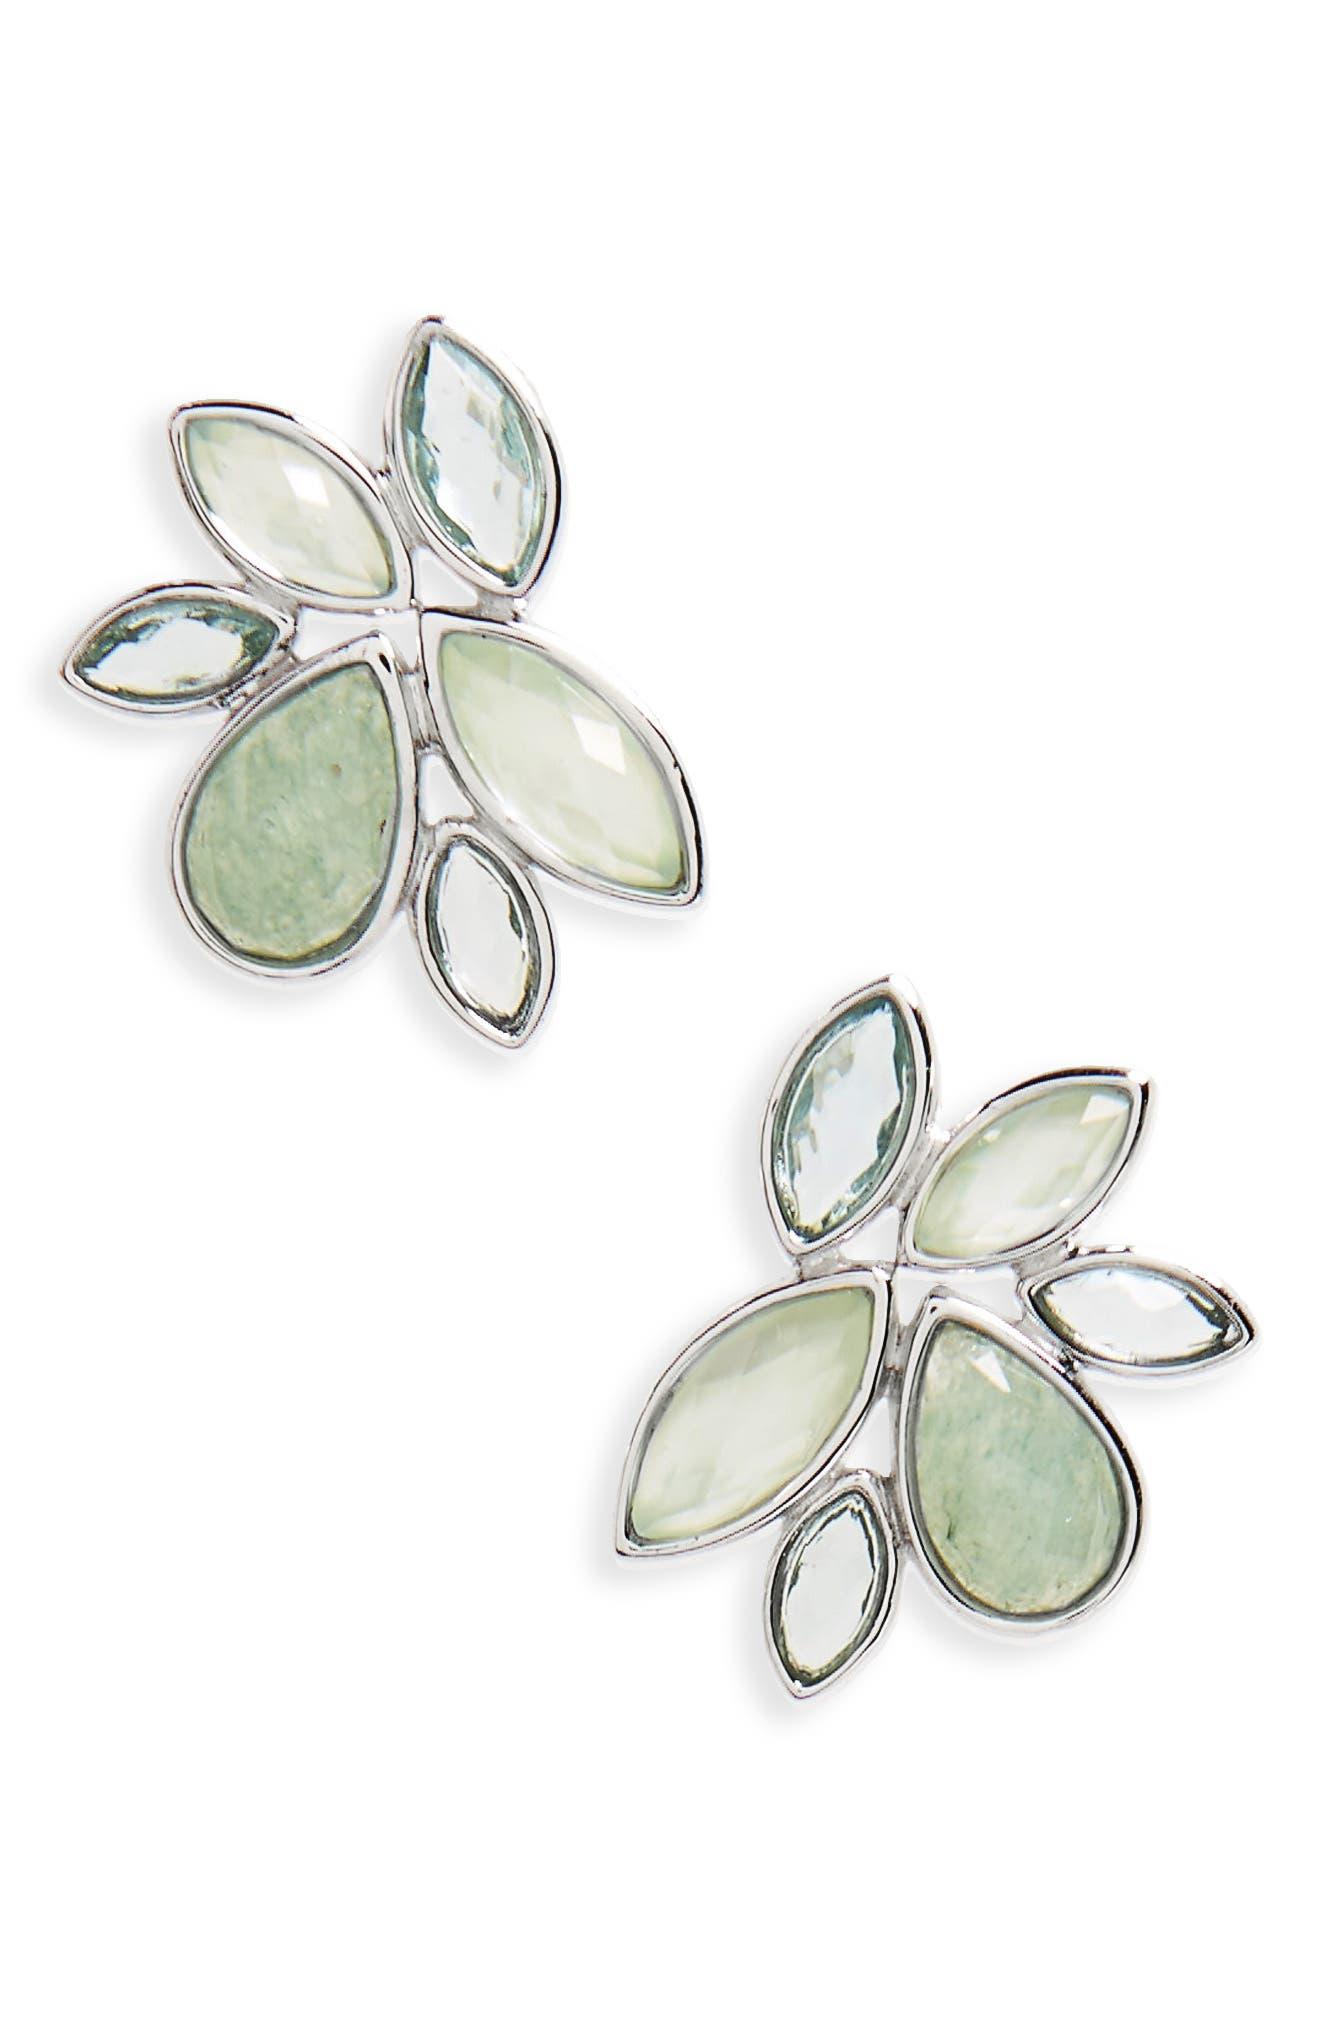 Judith Jack Lakeside Stud Earrings